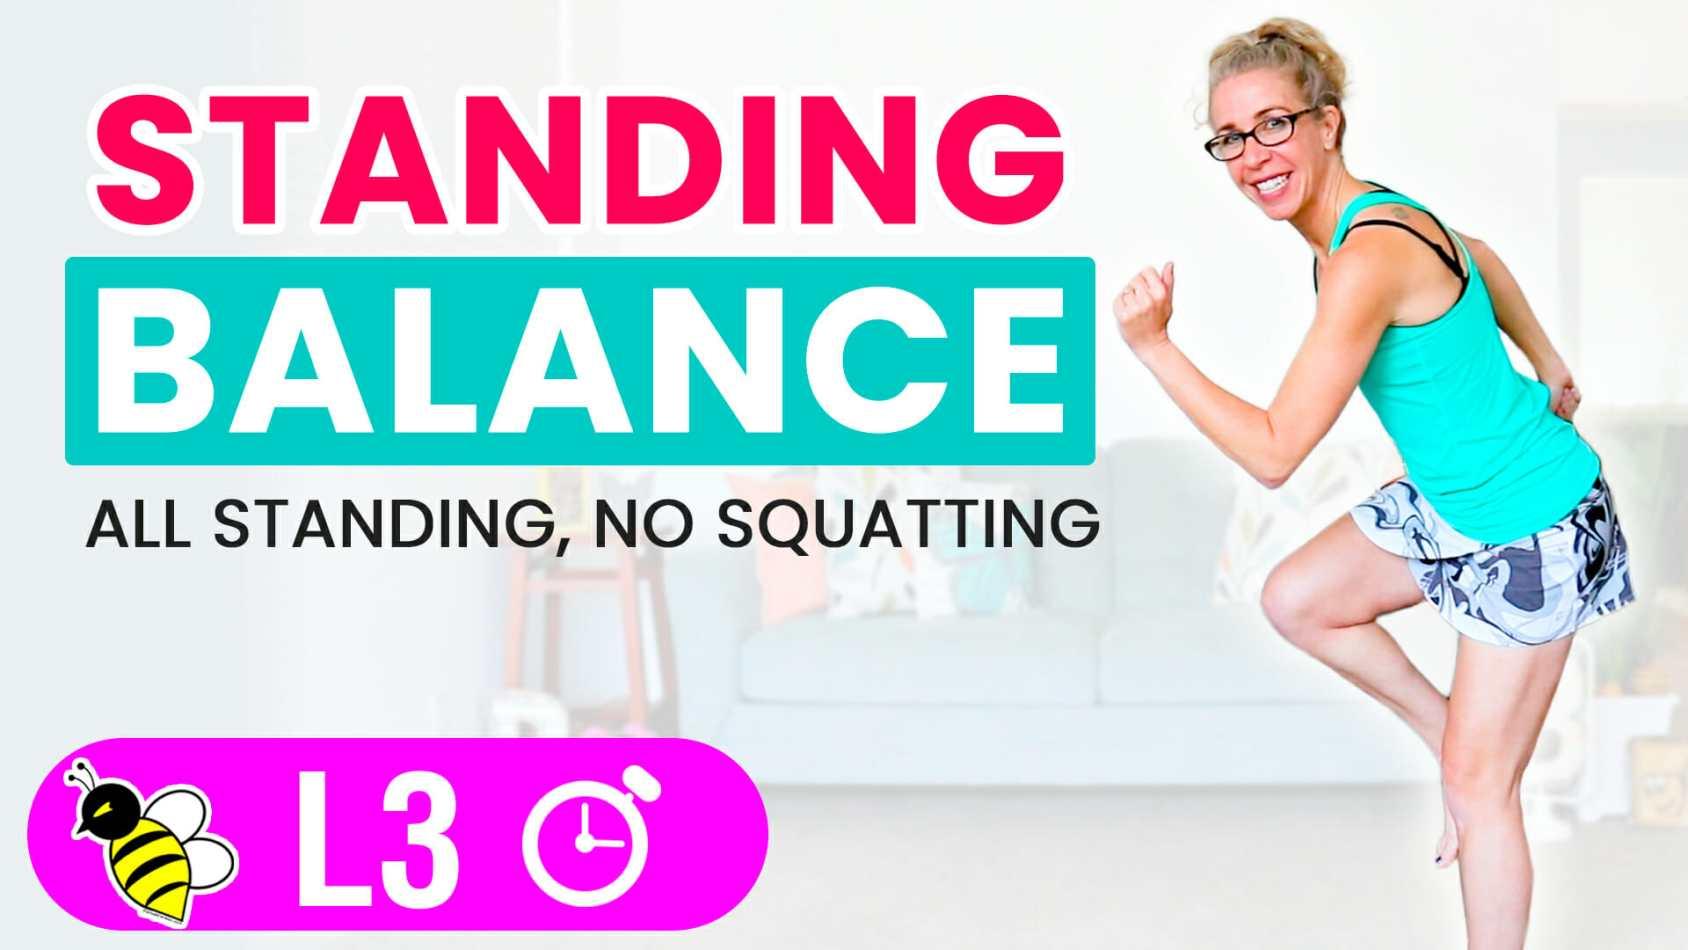 PR STRONG 10 minute standing BALANCE workout